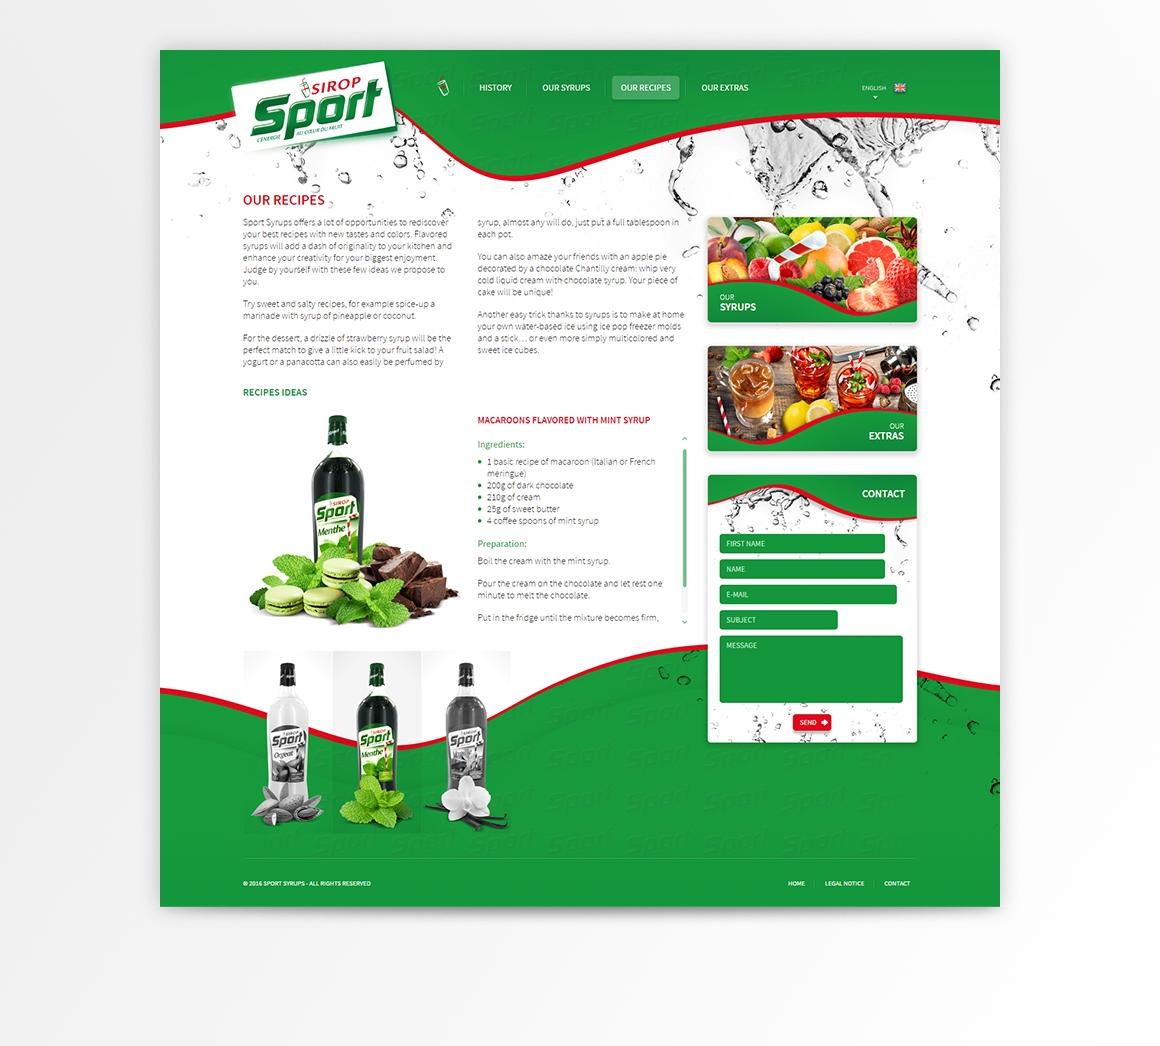 sirop-sport-05